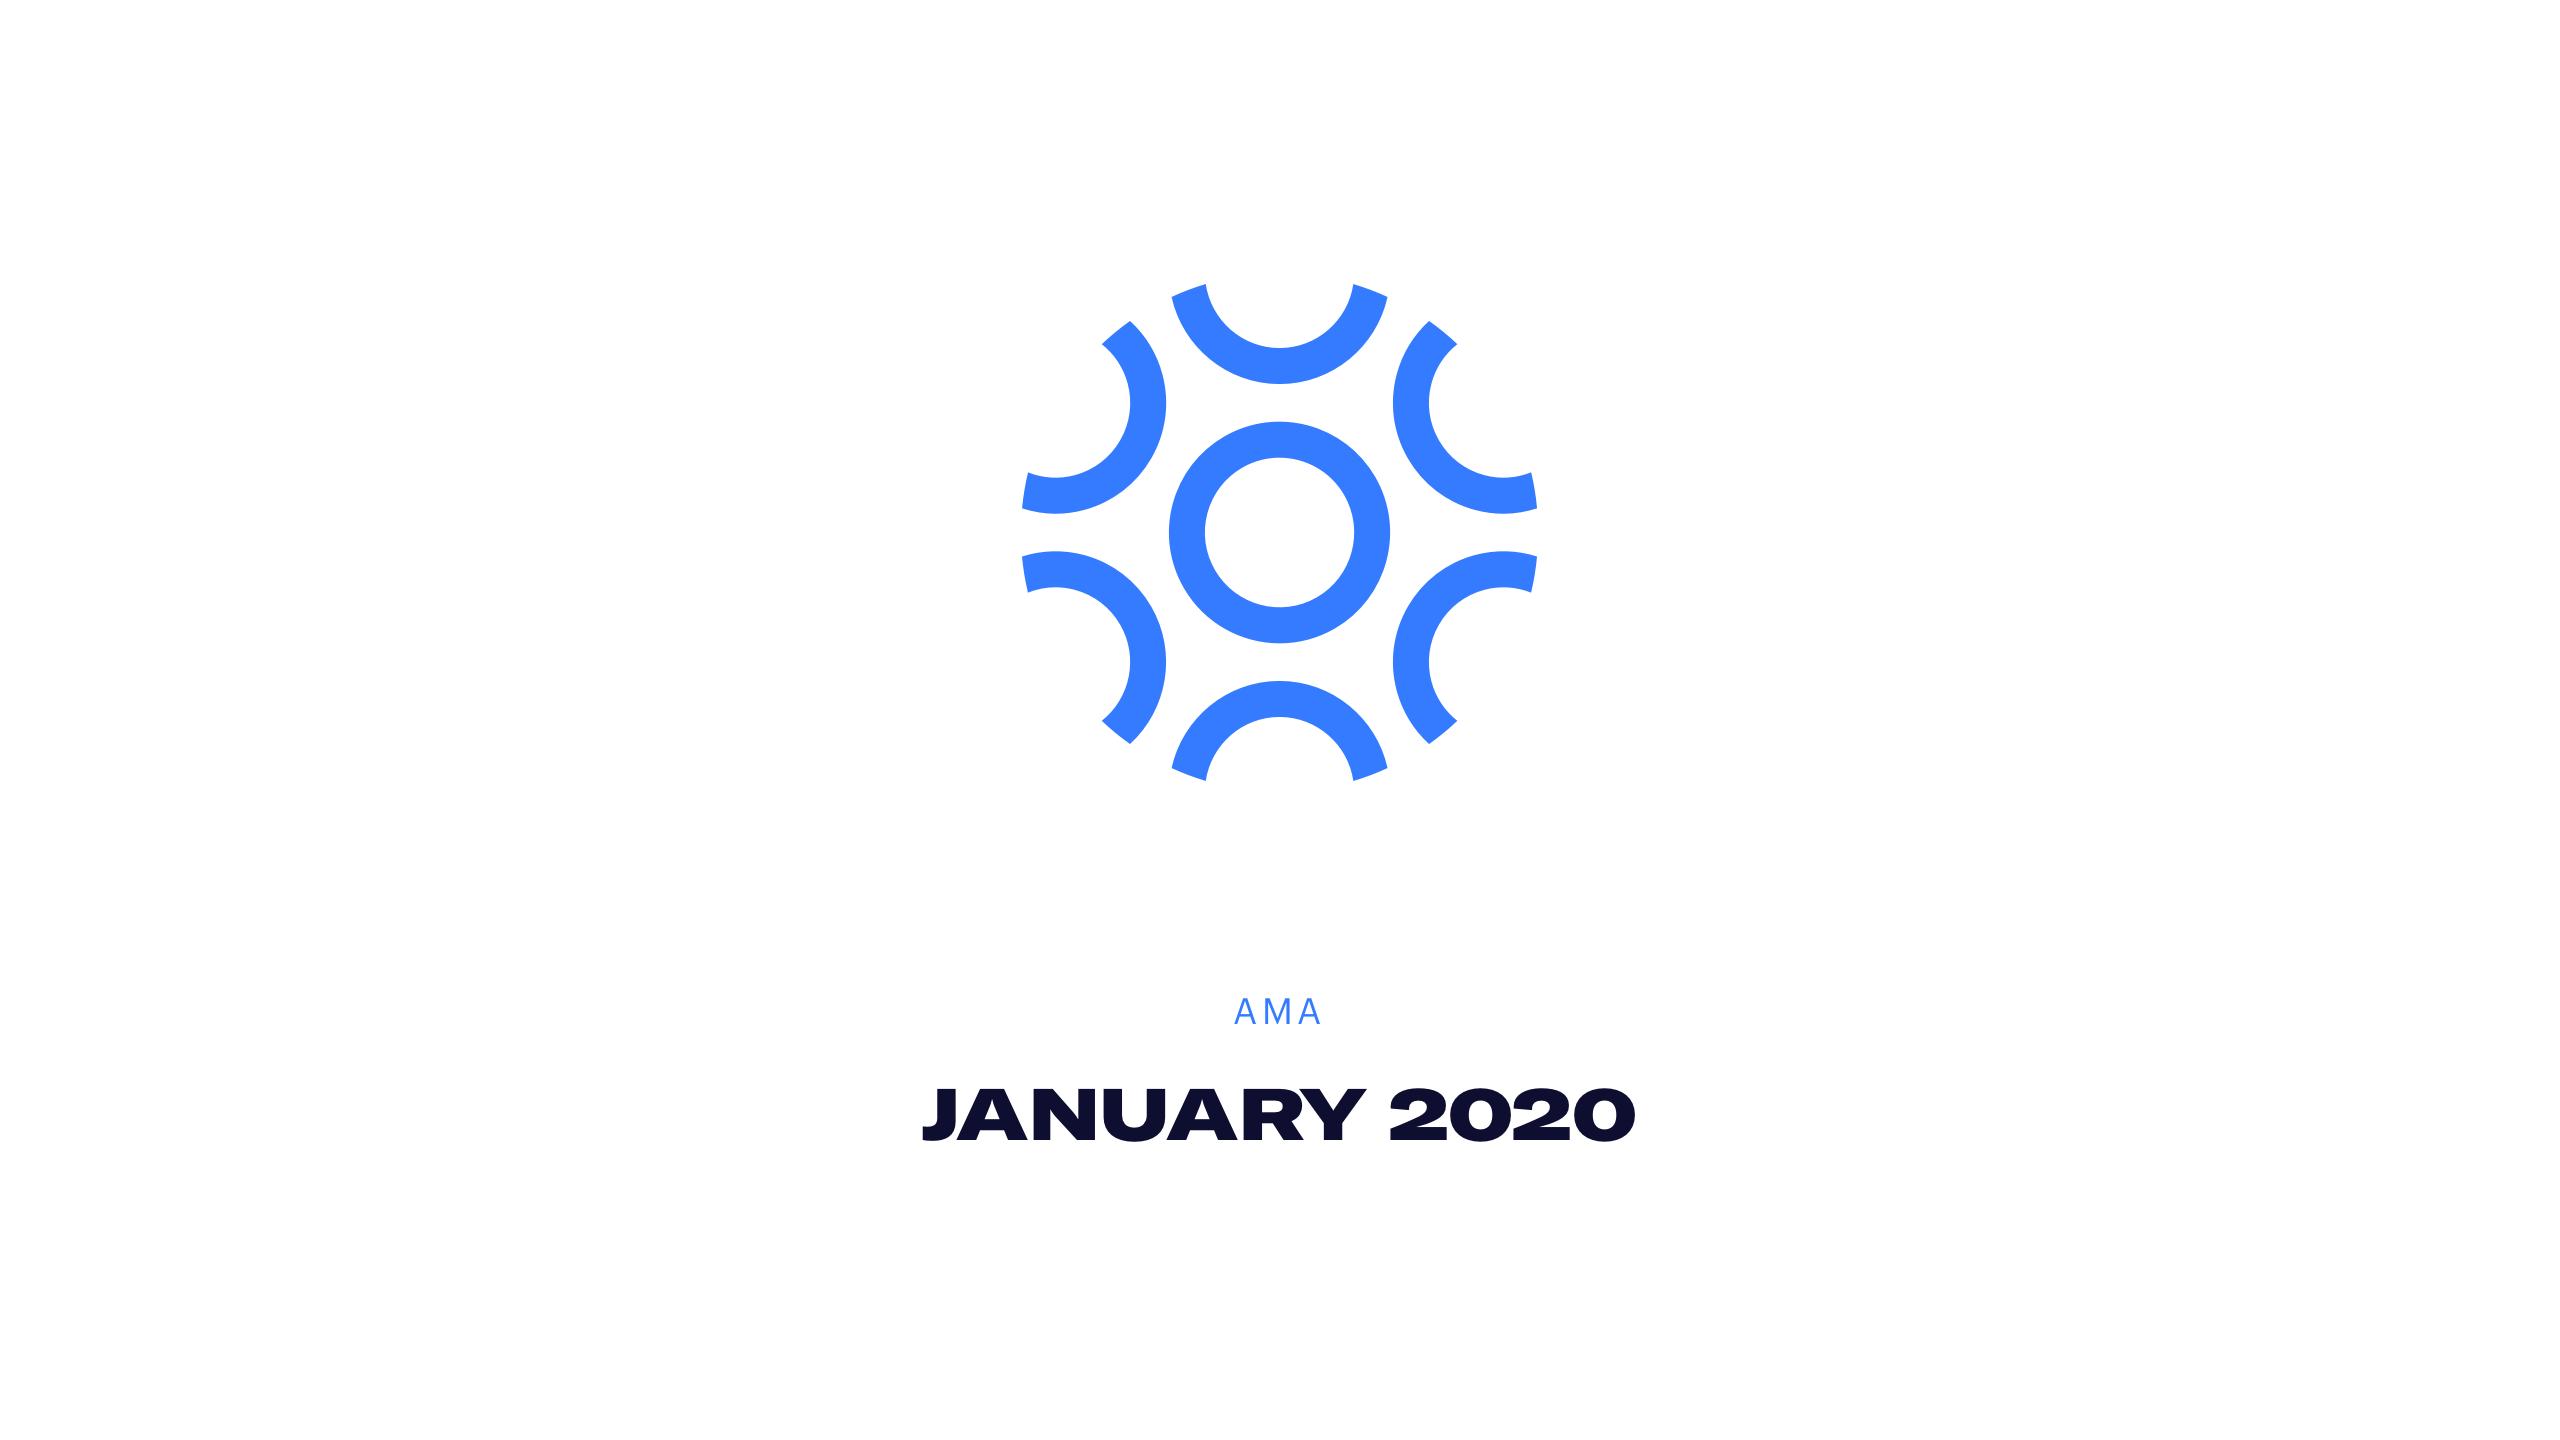 AMA - January 2020